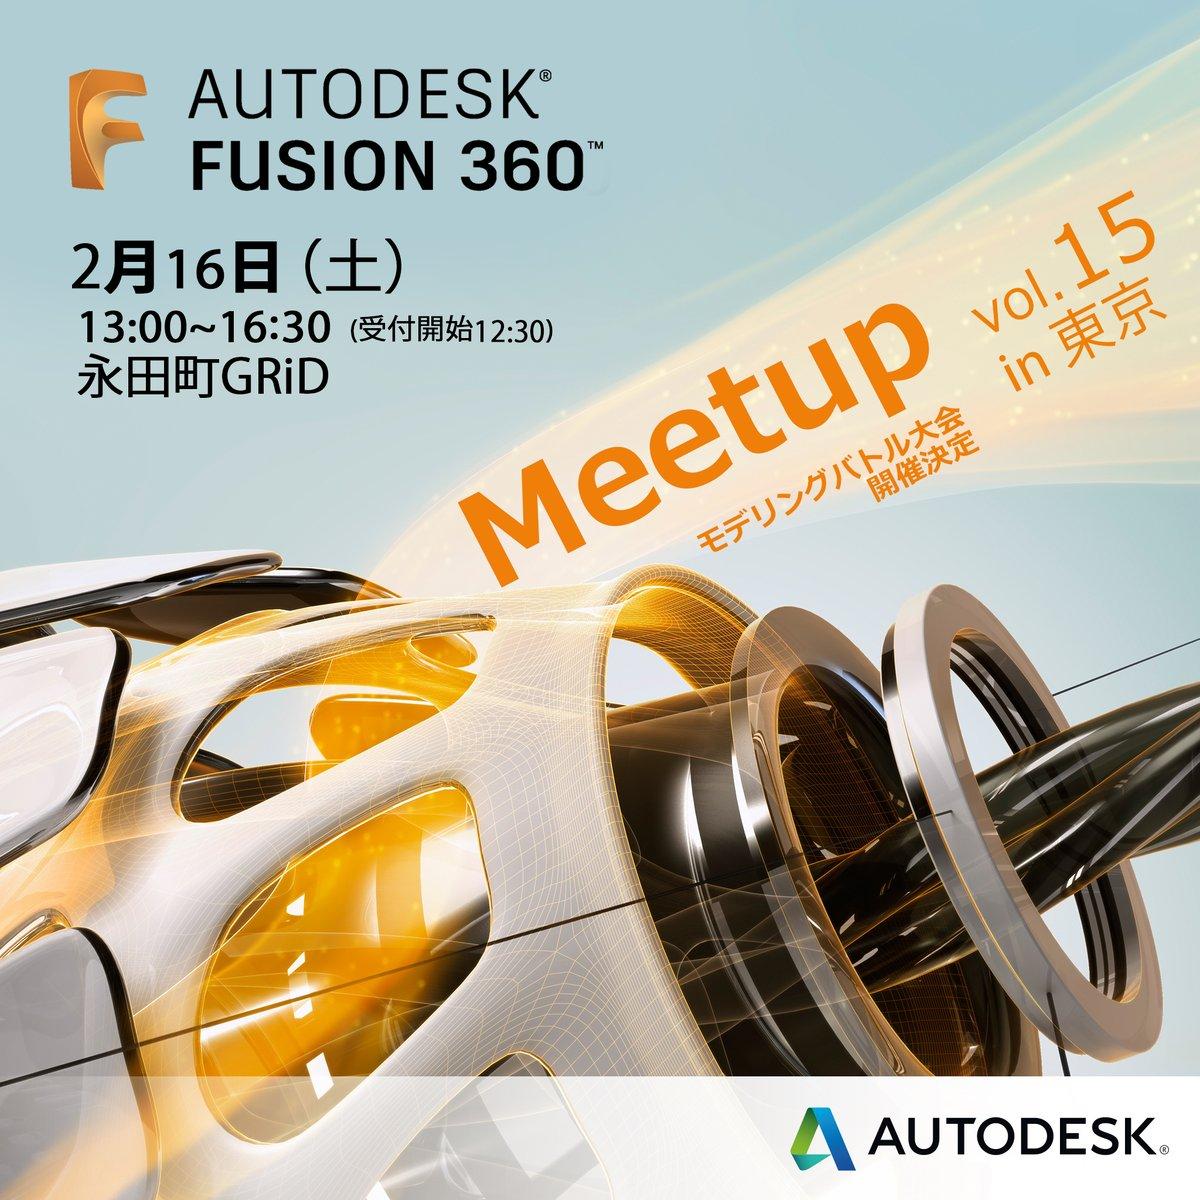 Fusion 360 Meetup 2/16 (土)に東京で開催!!